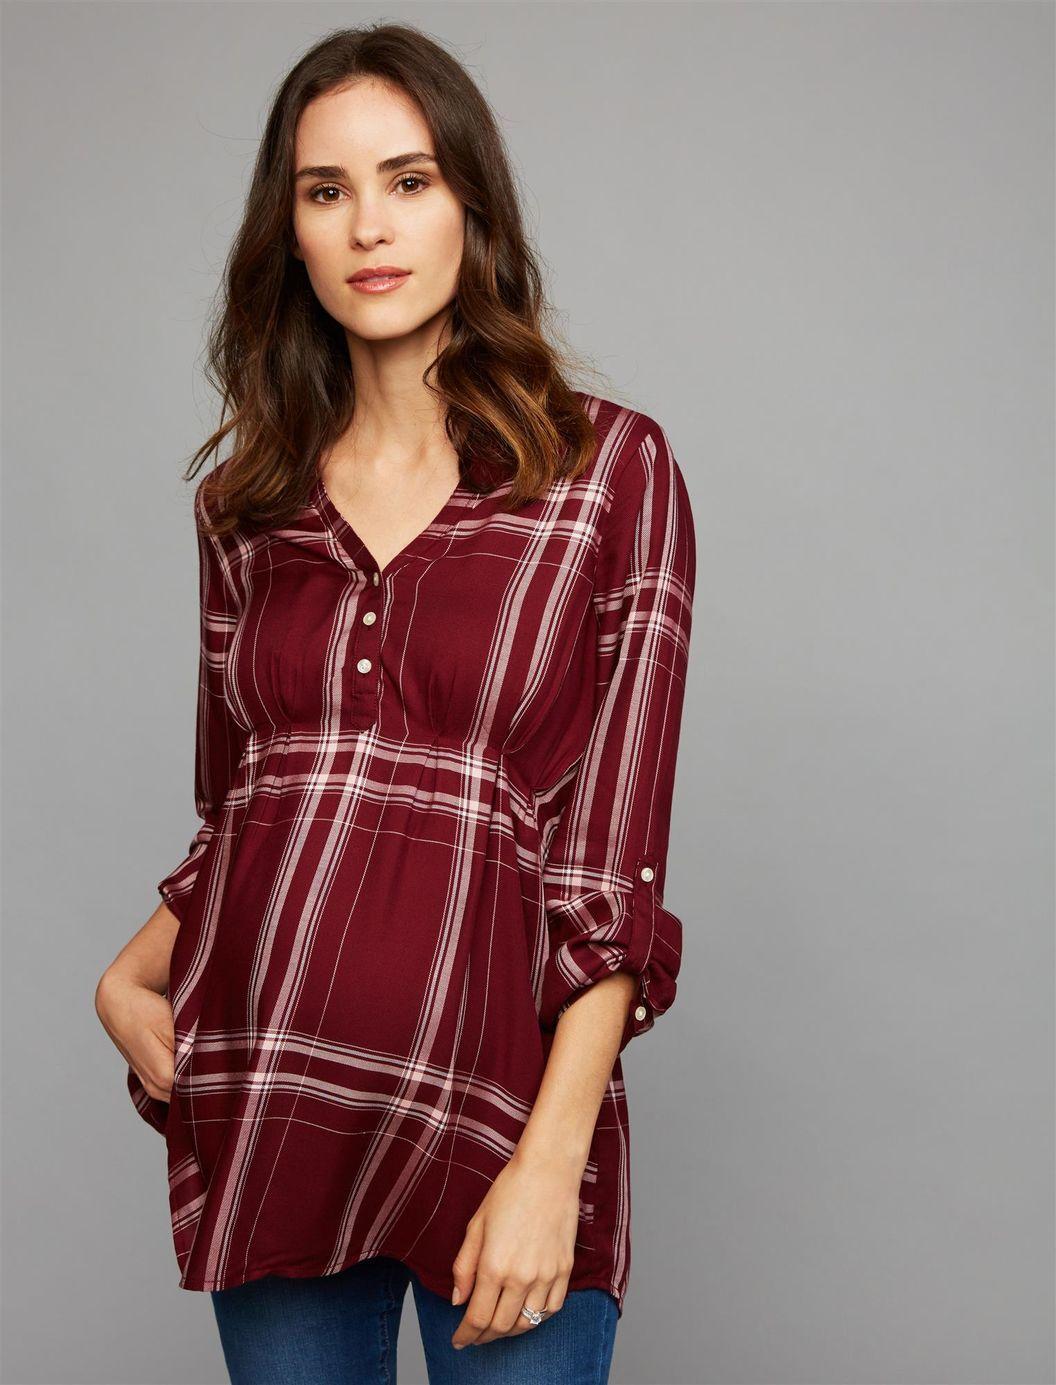 977ab93b4c8 Luxe Essentials Denim Plaid Convertible Maternity Shirt, Plaid Burgundy